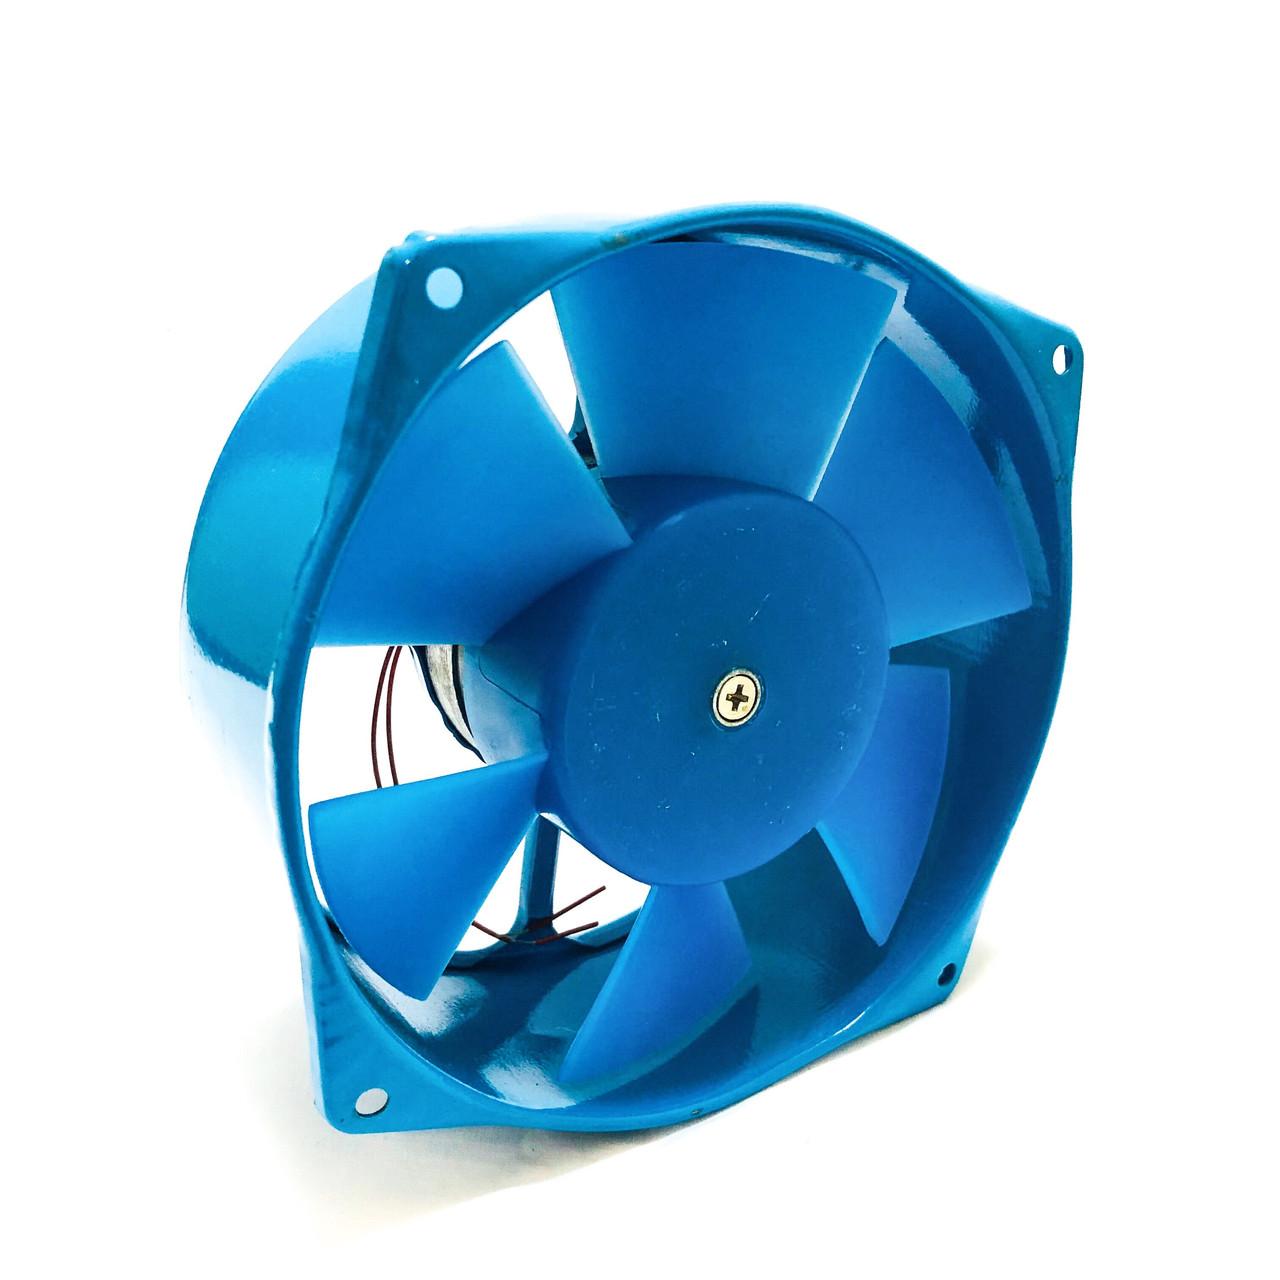 Вентилятор к промышленному оборудованию-380V АС, (157х157х60мм),30 Ватт